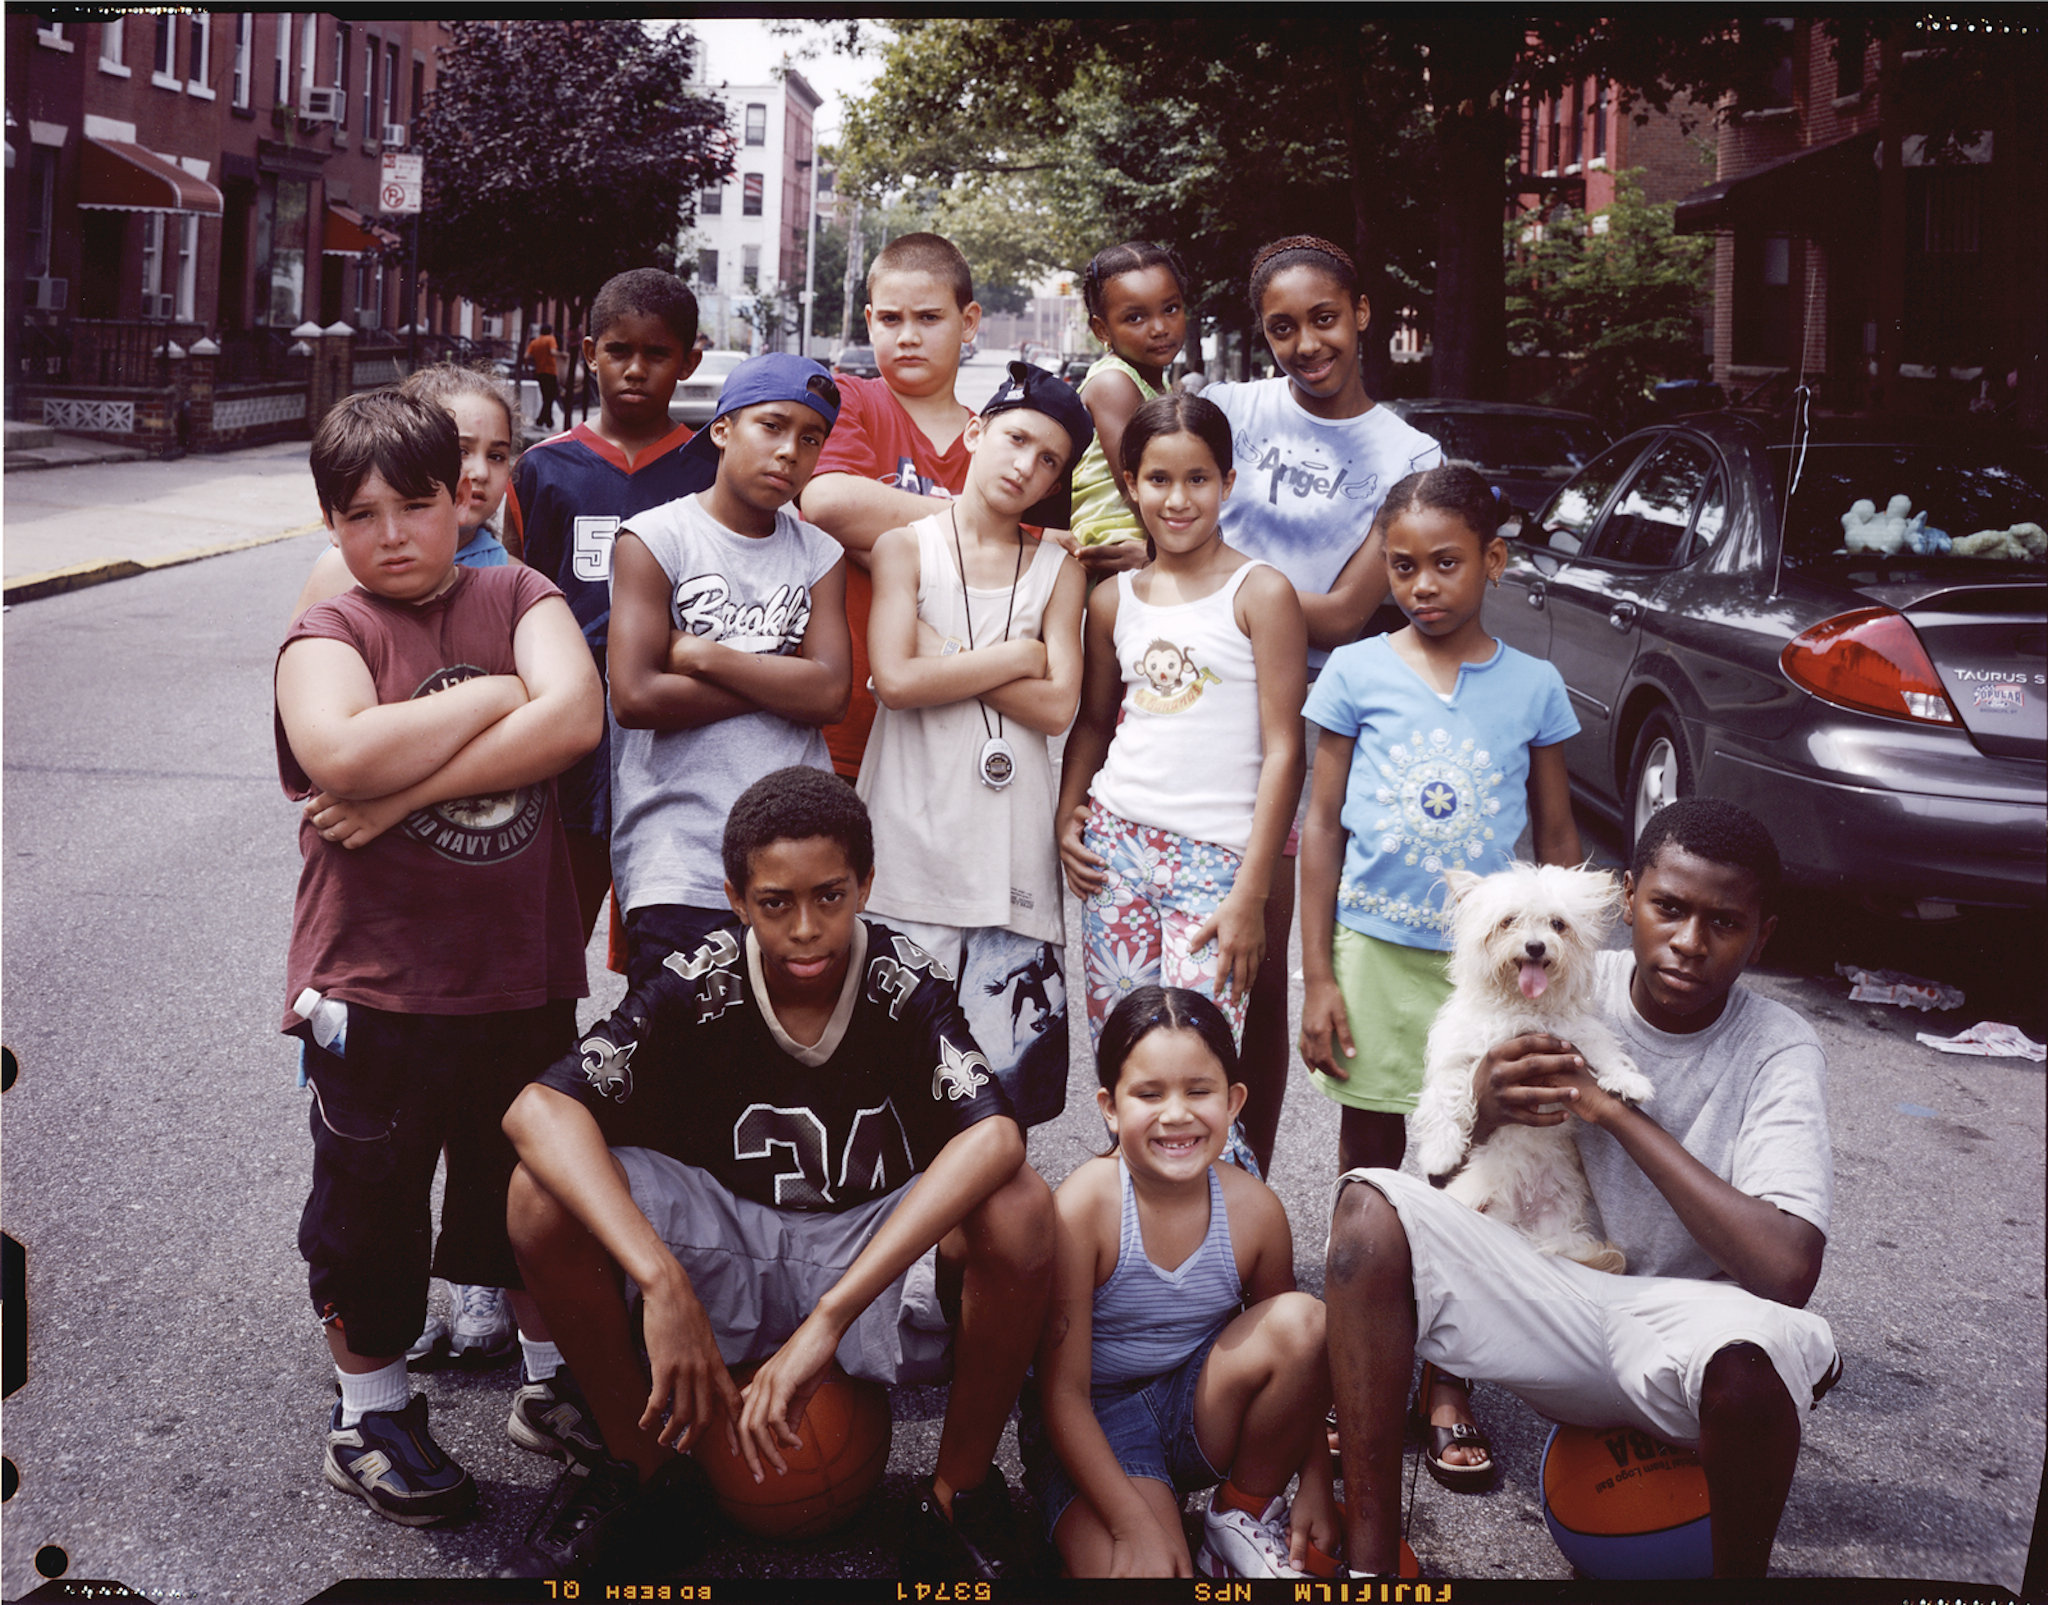 Kids from 8th st. Brooklyn, NY